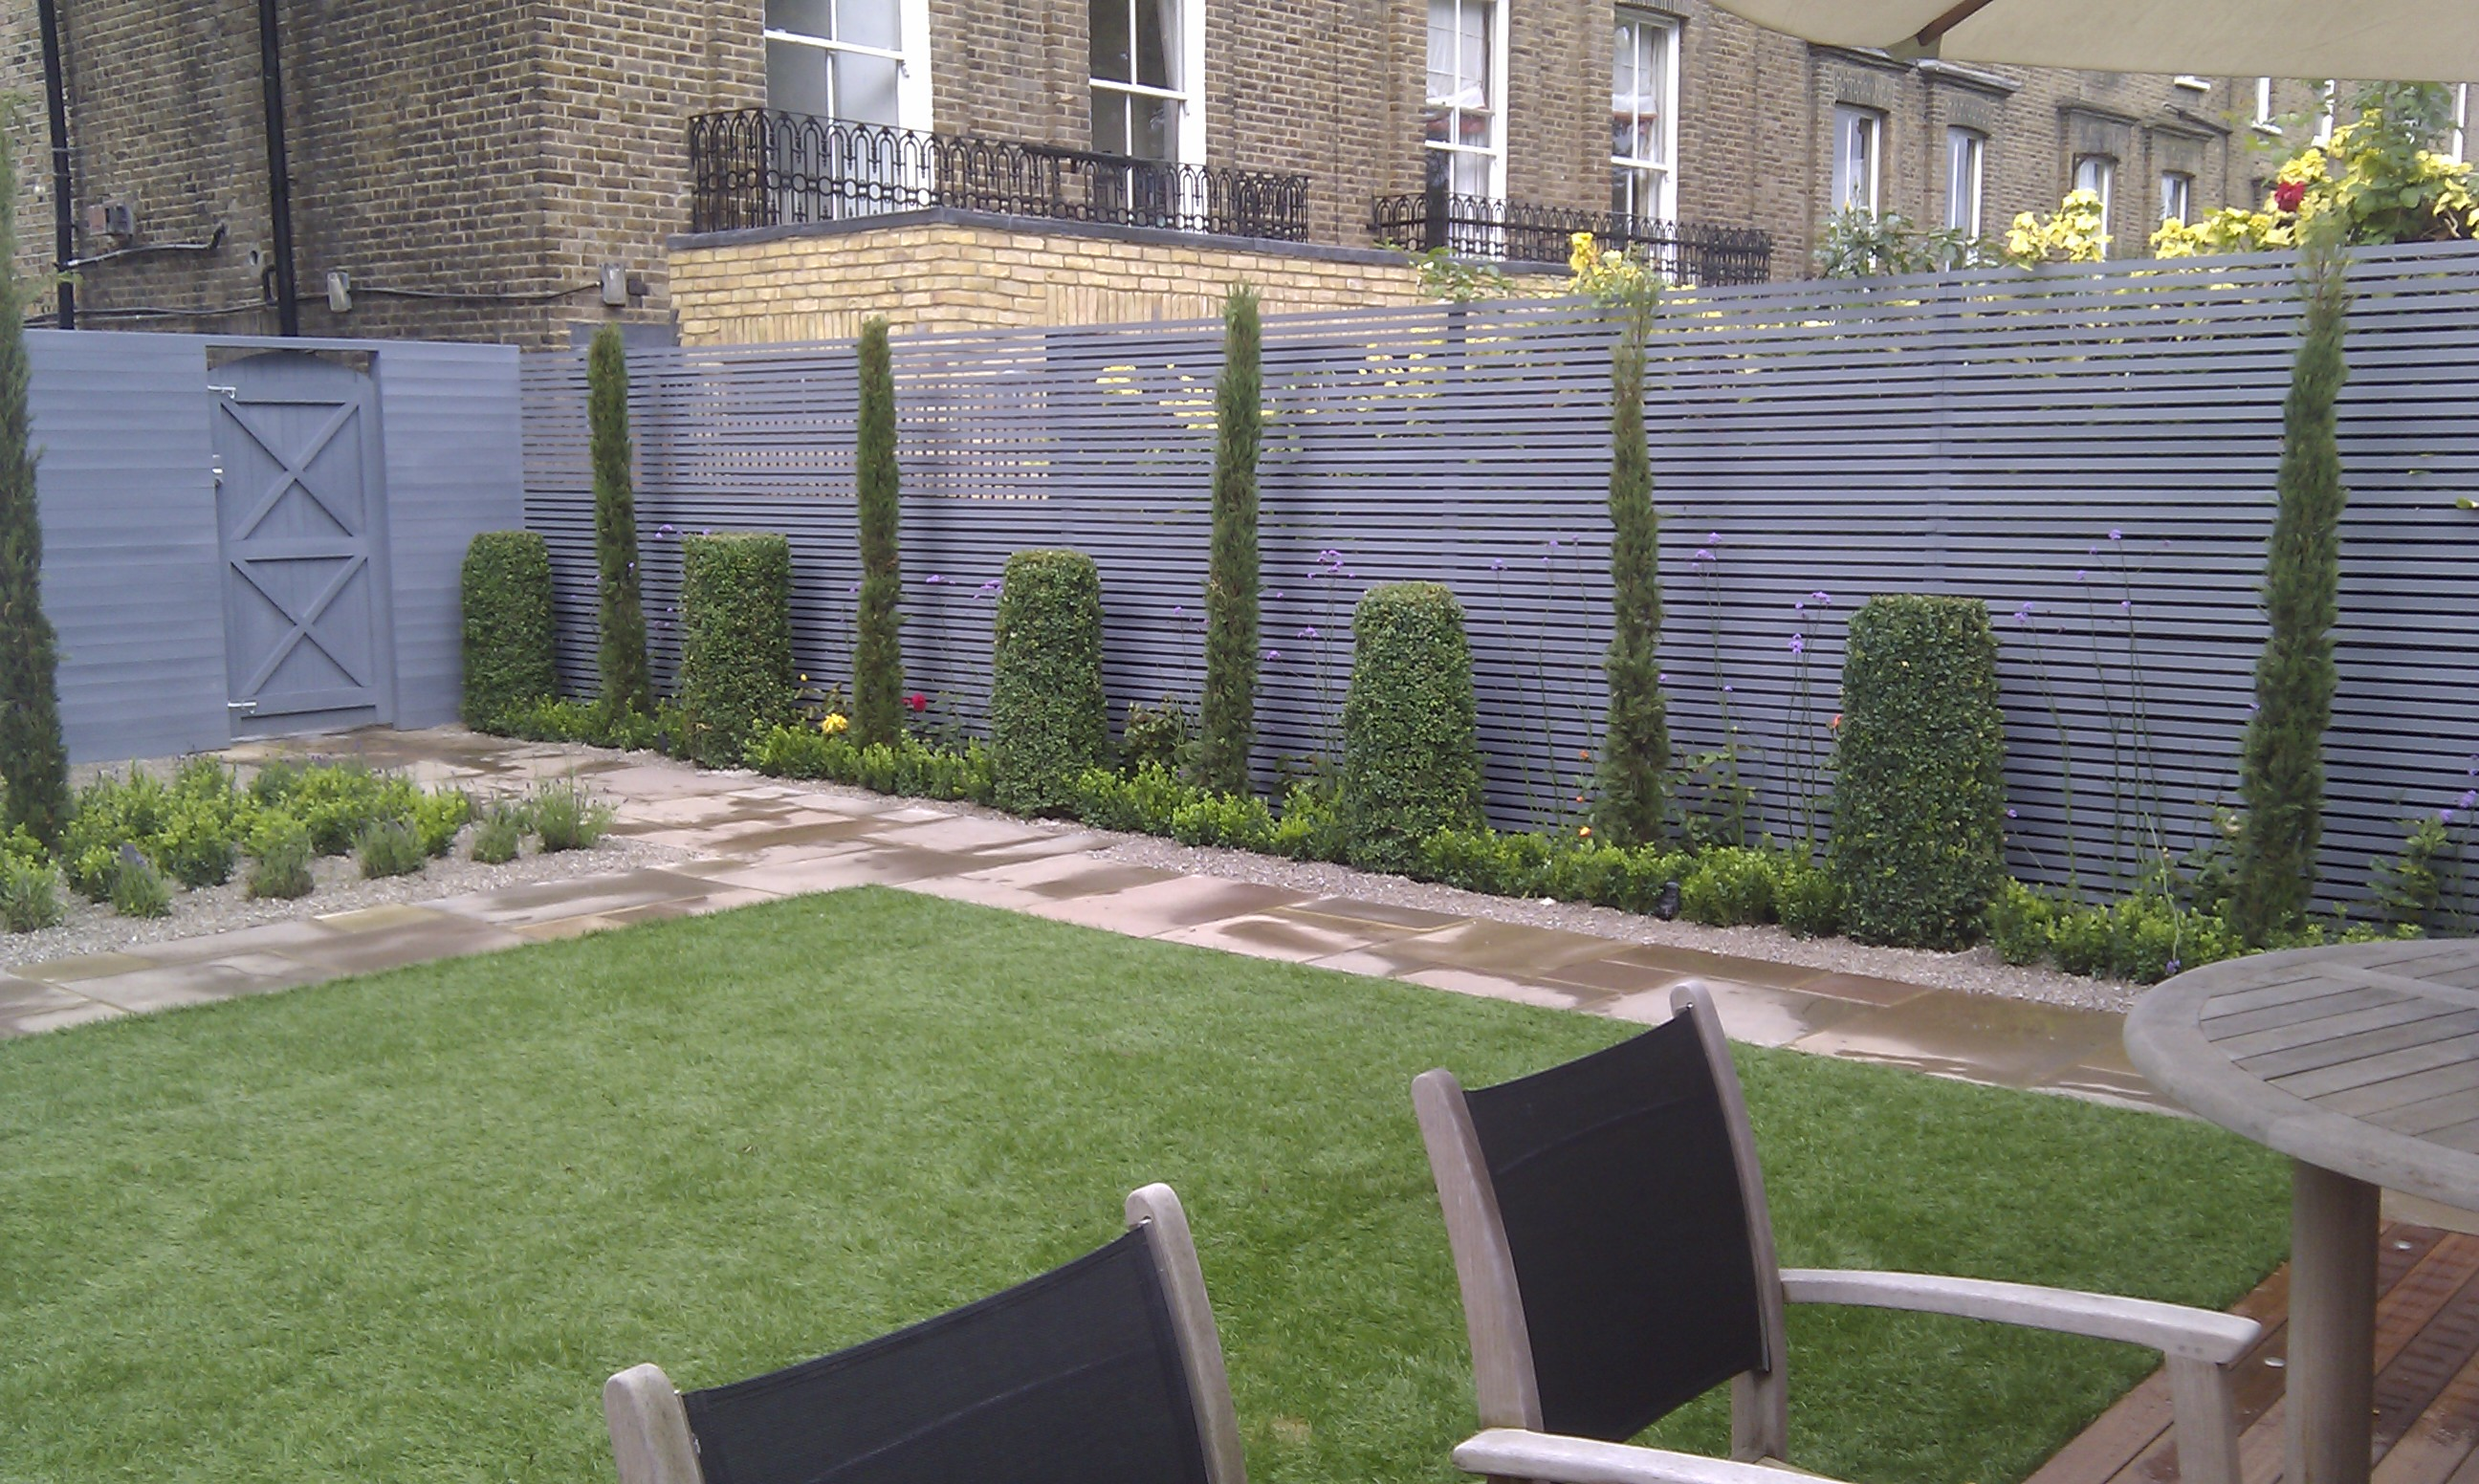 modern garden design london slatted grey privacy screen sandstone paving easy grass balau hardwood decking (13)